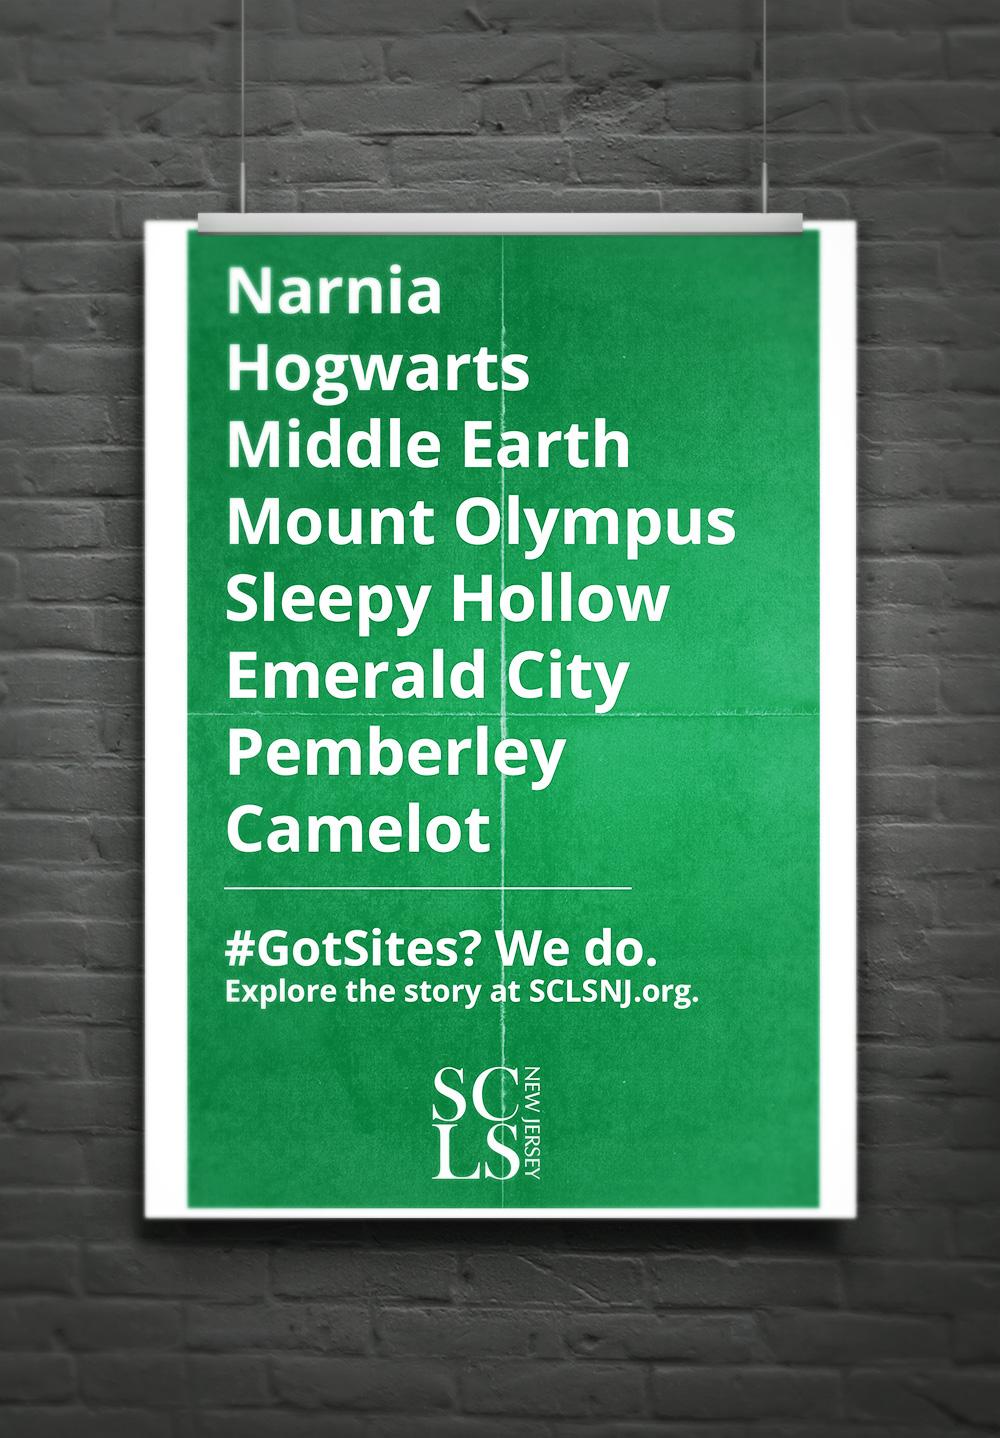 Explore the Story Literacy Campaign: #GotSites by Carolann DeMatos of Wonderpug Graphics